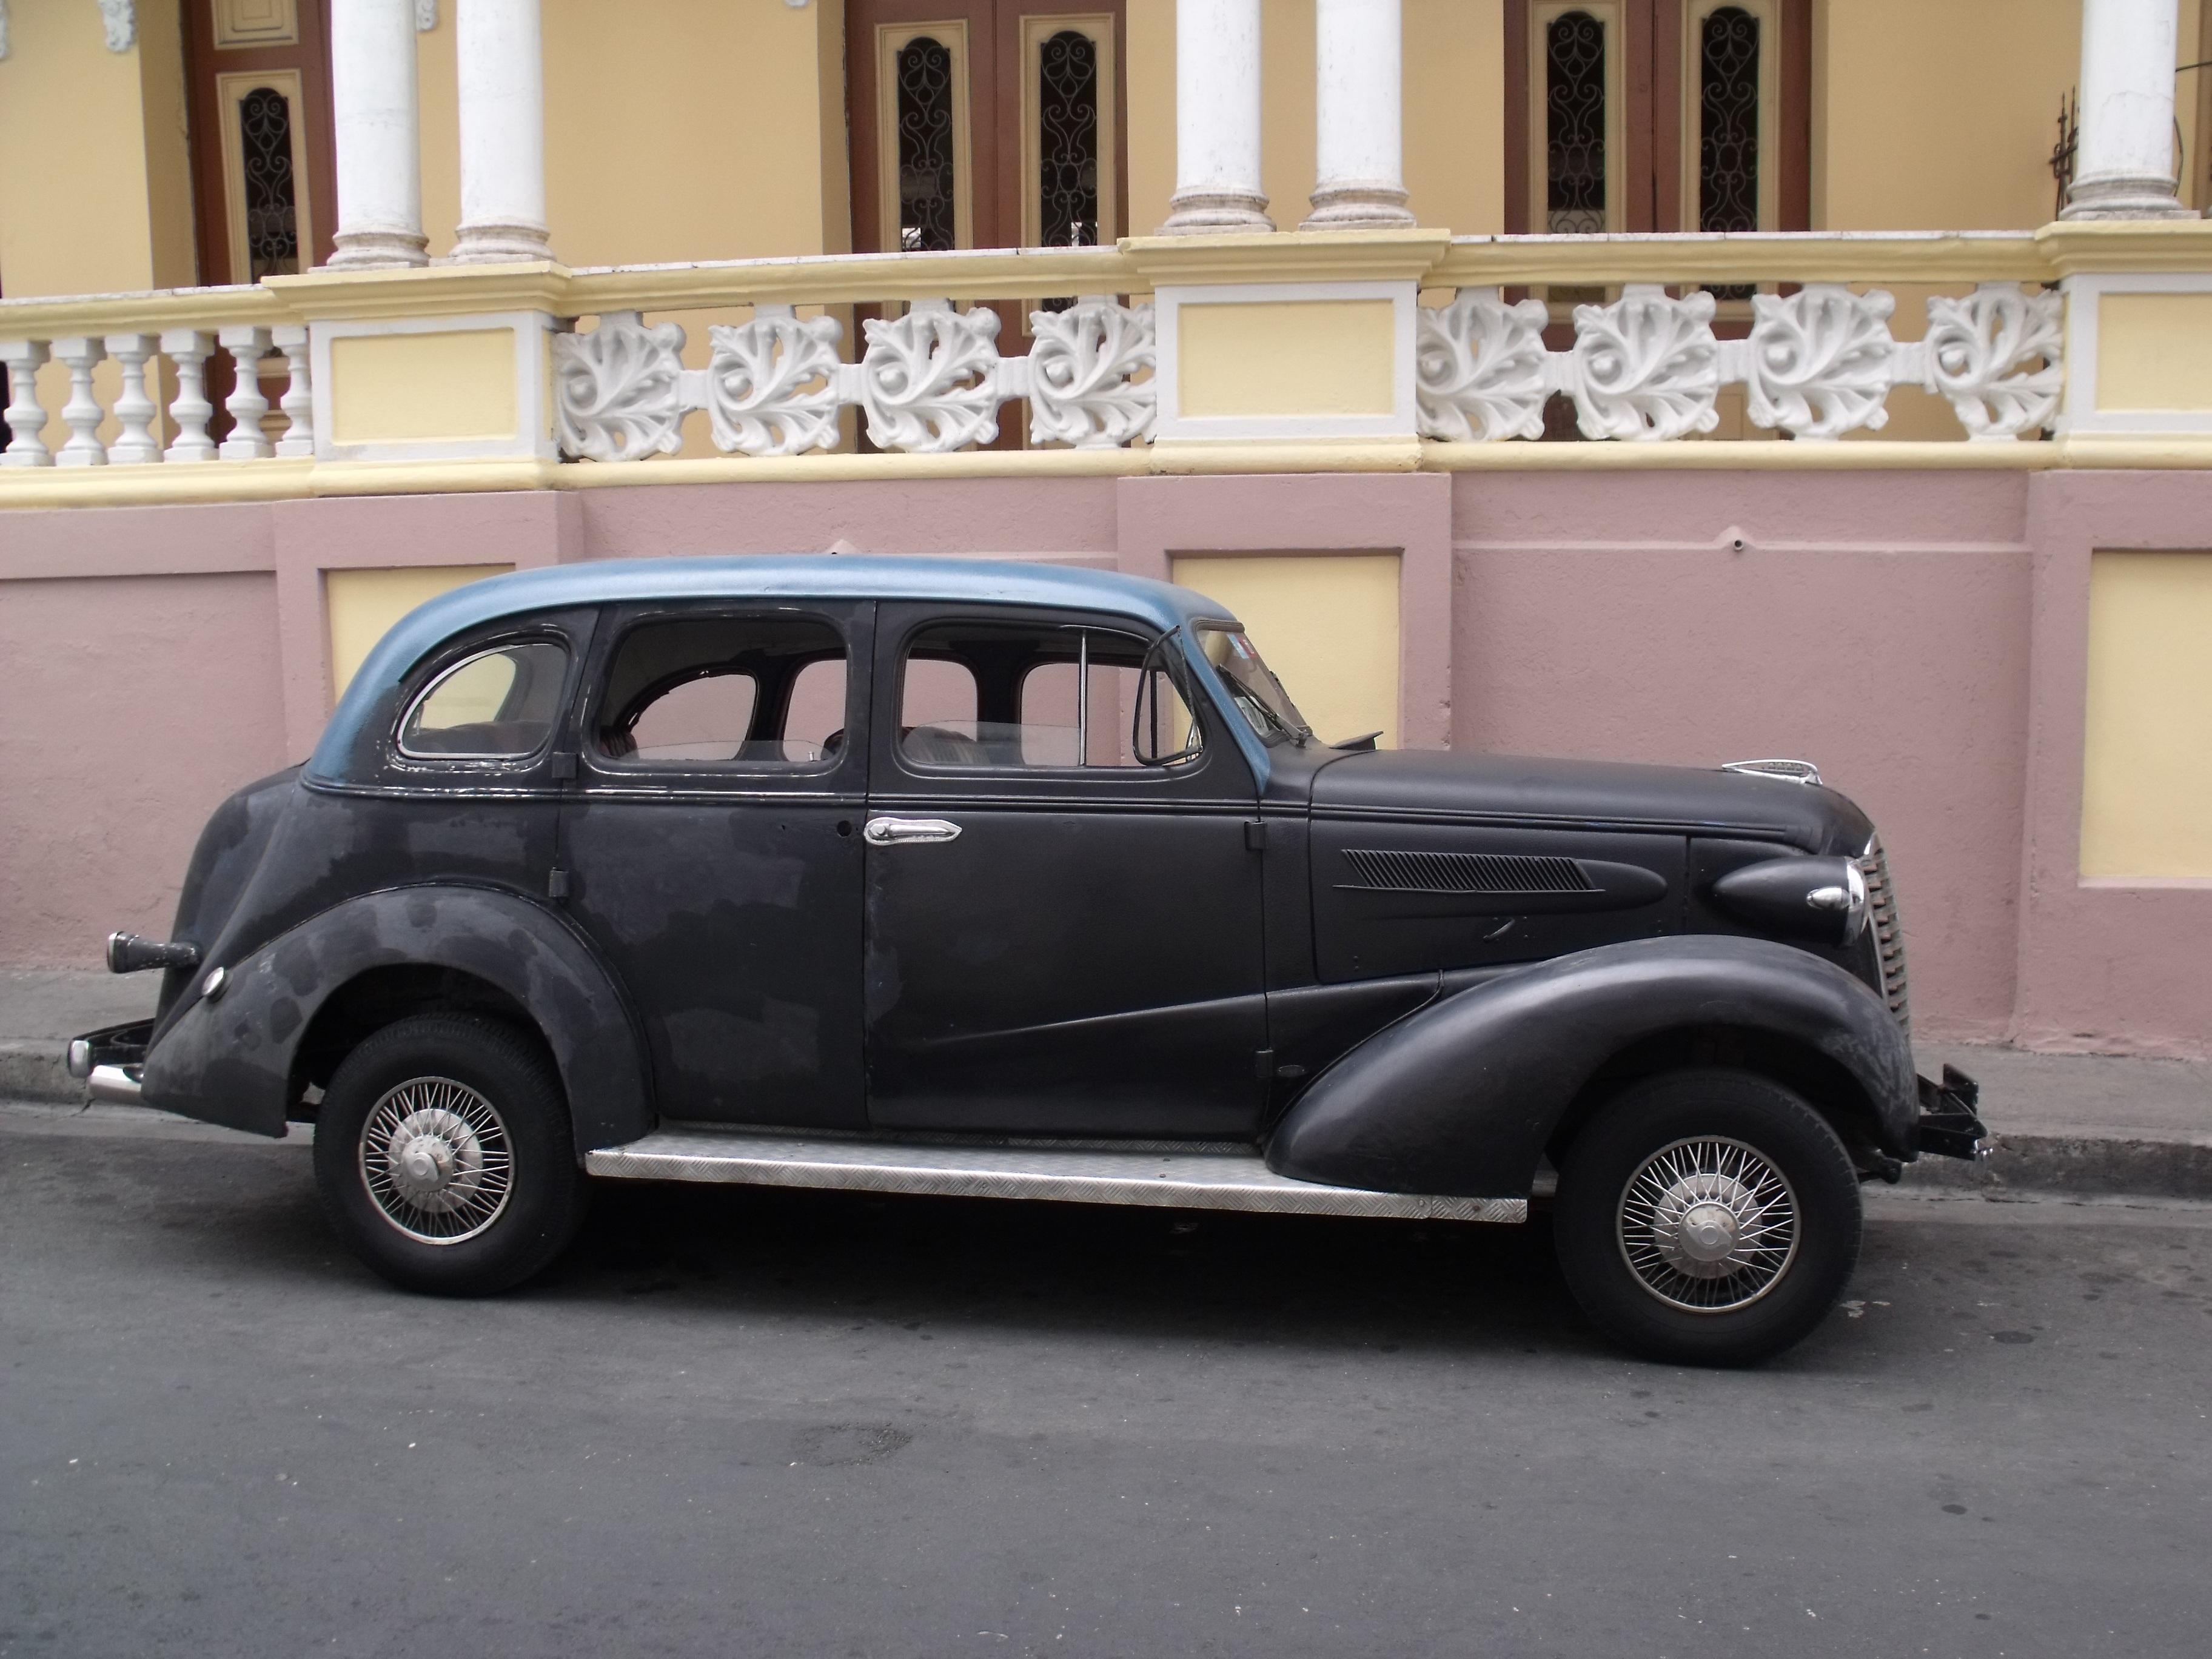 Free Images : motor vehicle, vintage car, cuba, sedan, classic ...